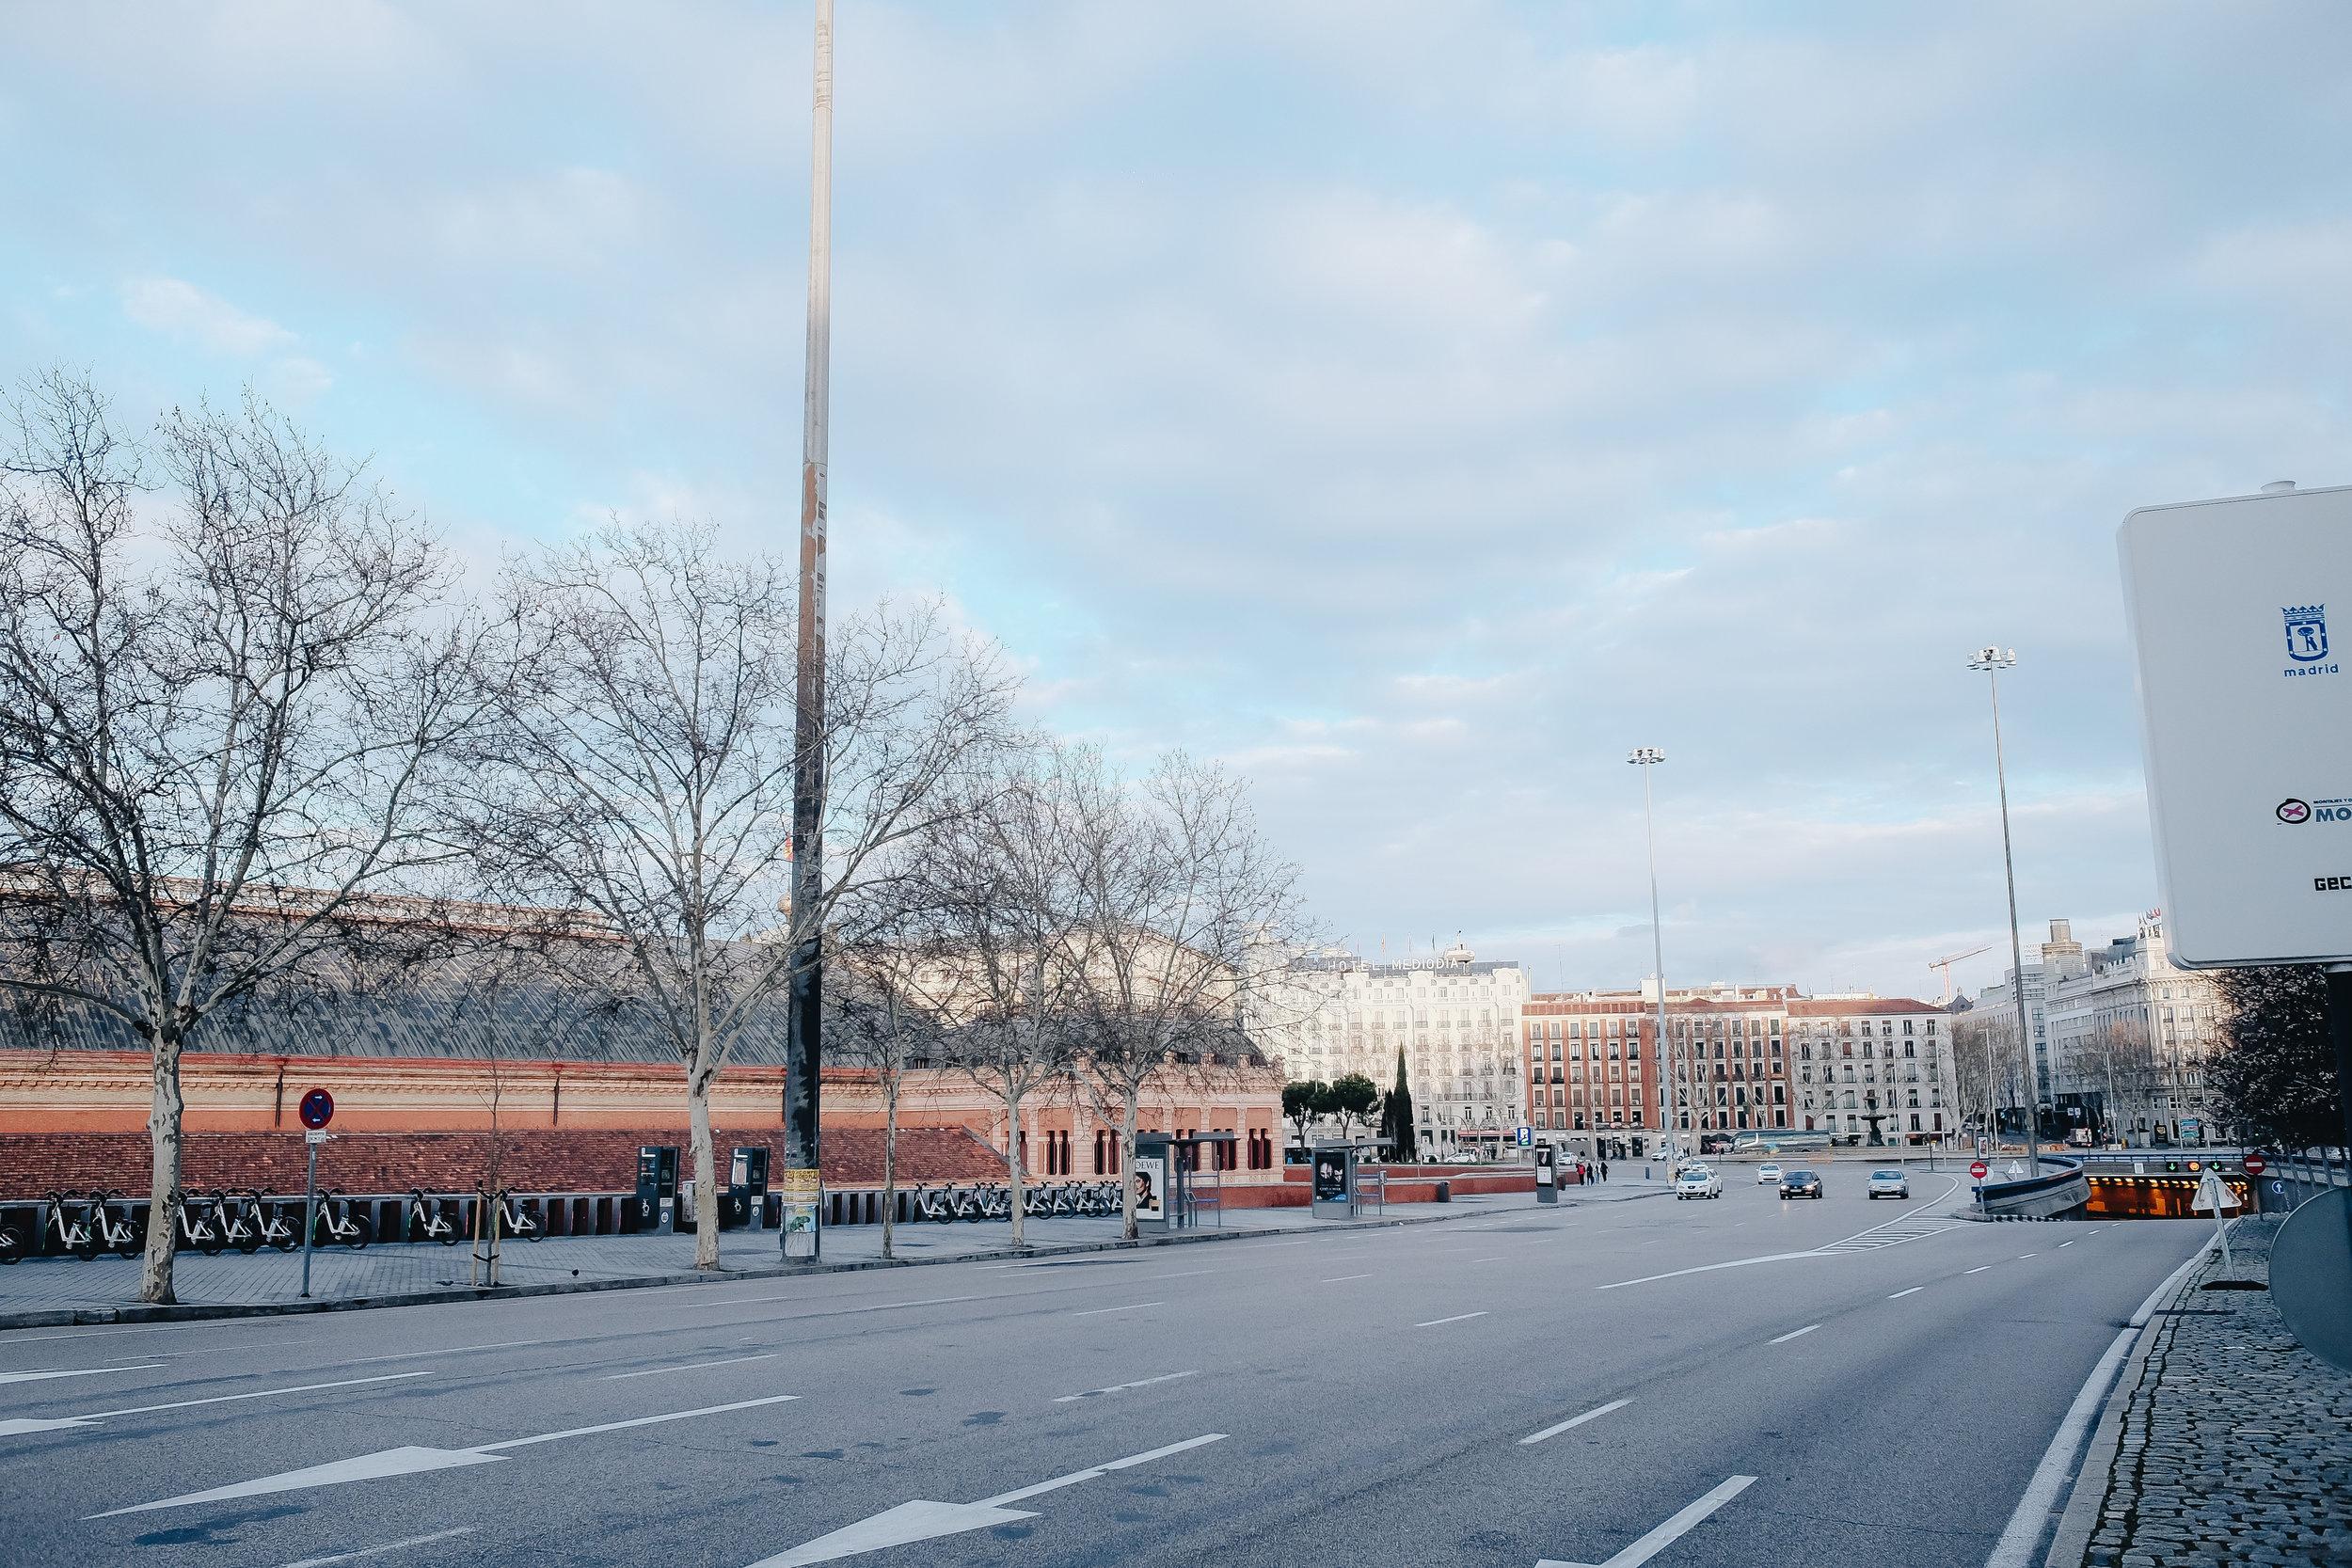 1.1. Madrid Atocha Railway Station_1.jpg